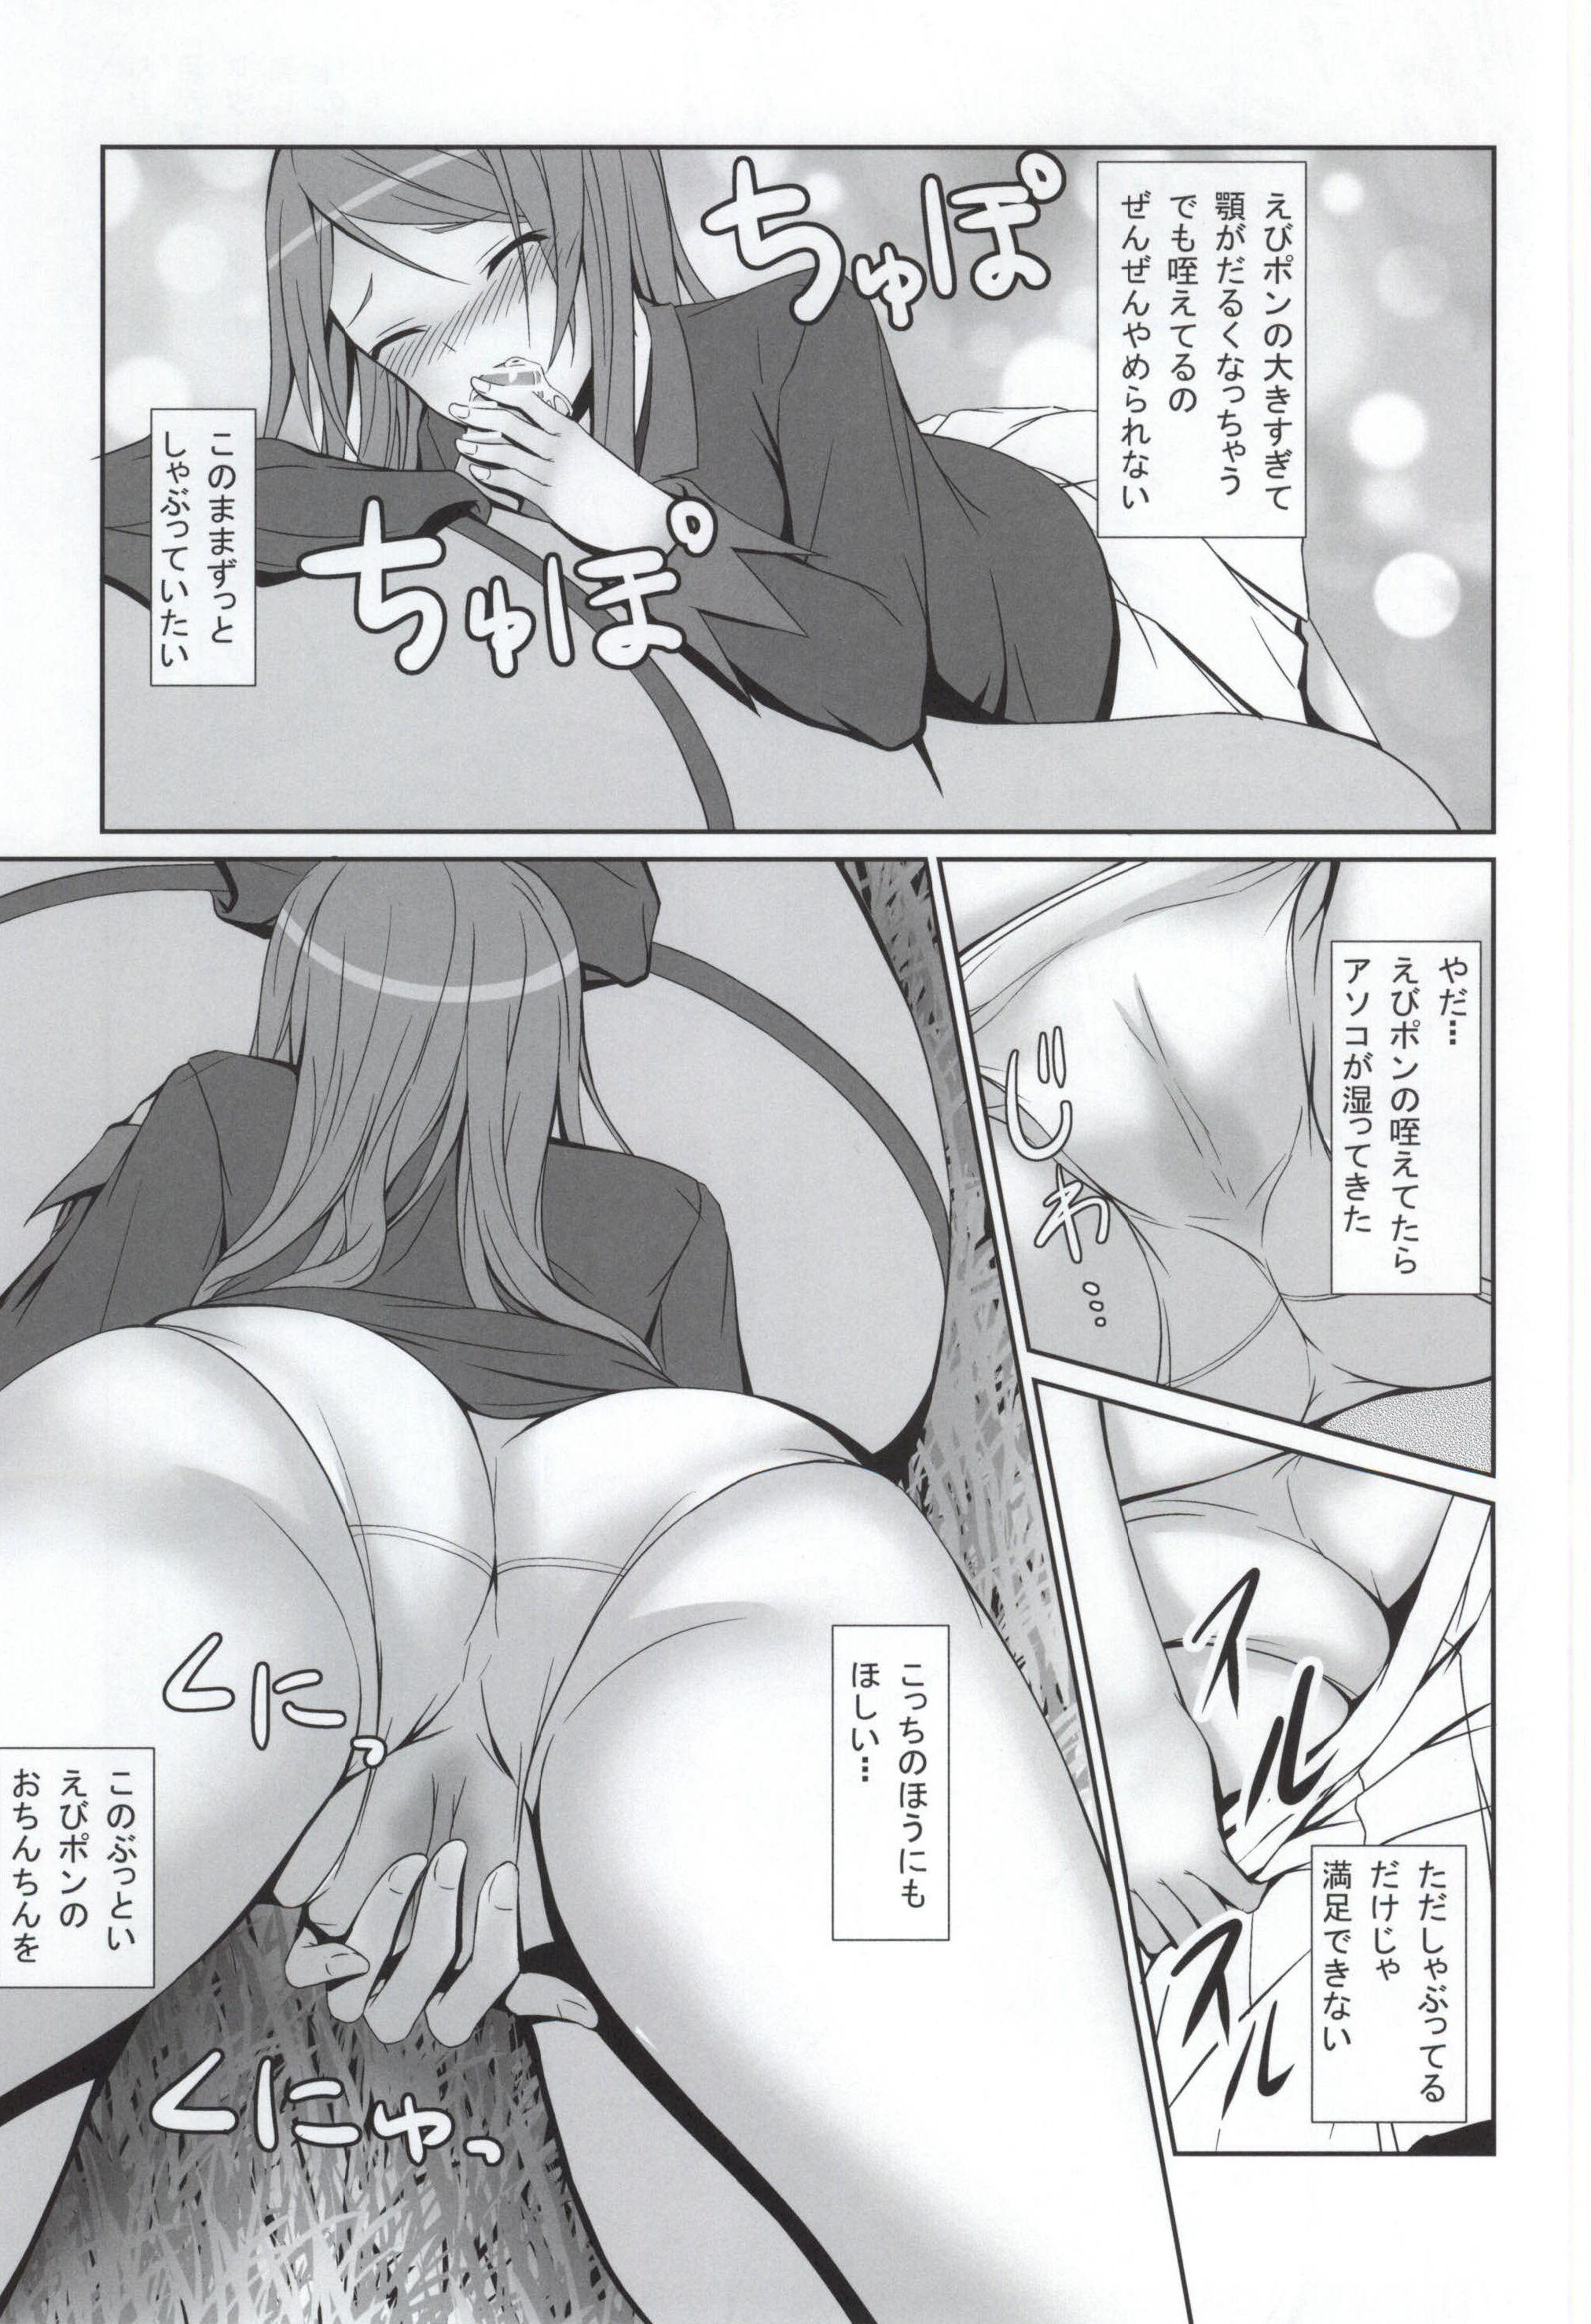 Ran-chan to Ebipon! 5